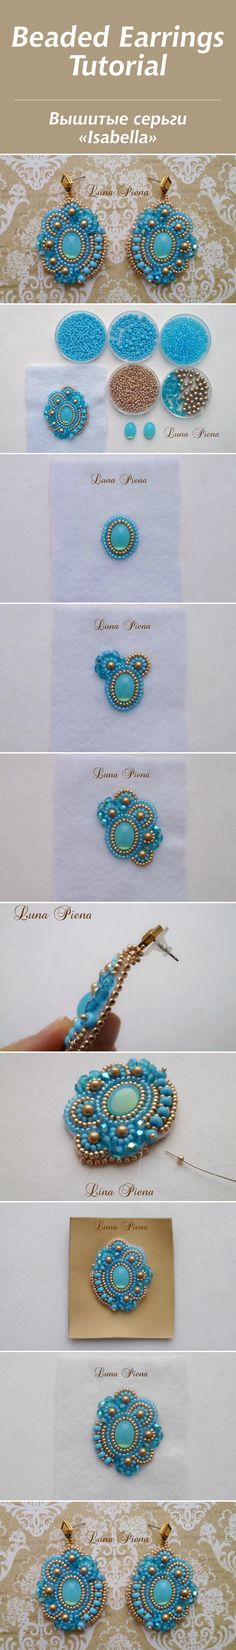 "Мастер-класс: вышитые серьги ""Isabella"" #diy #tutorial #craft #handmade #beadwork"